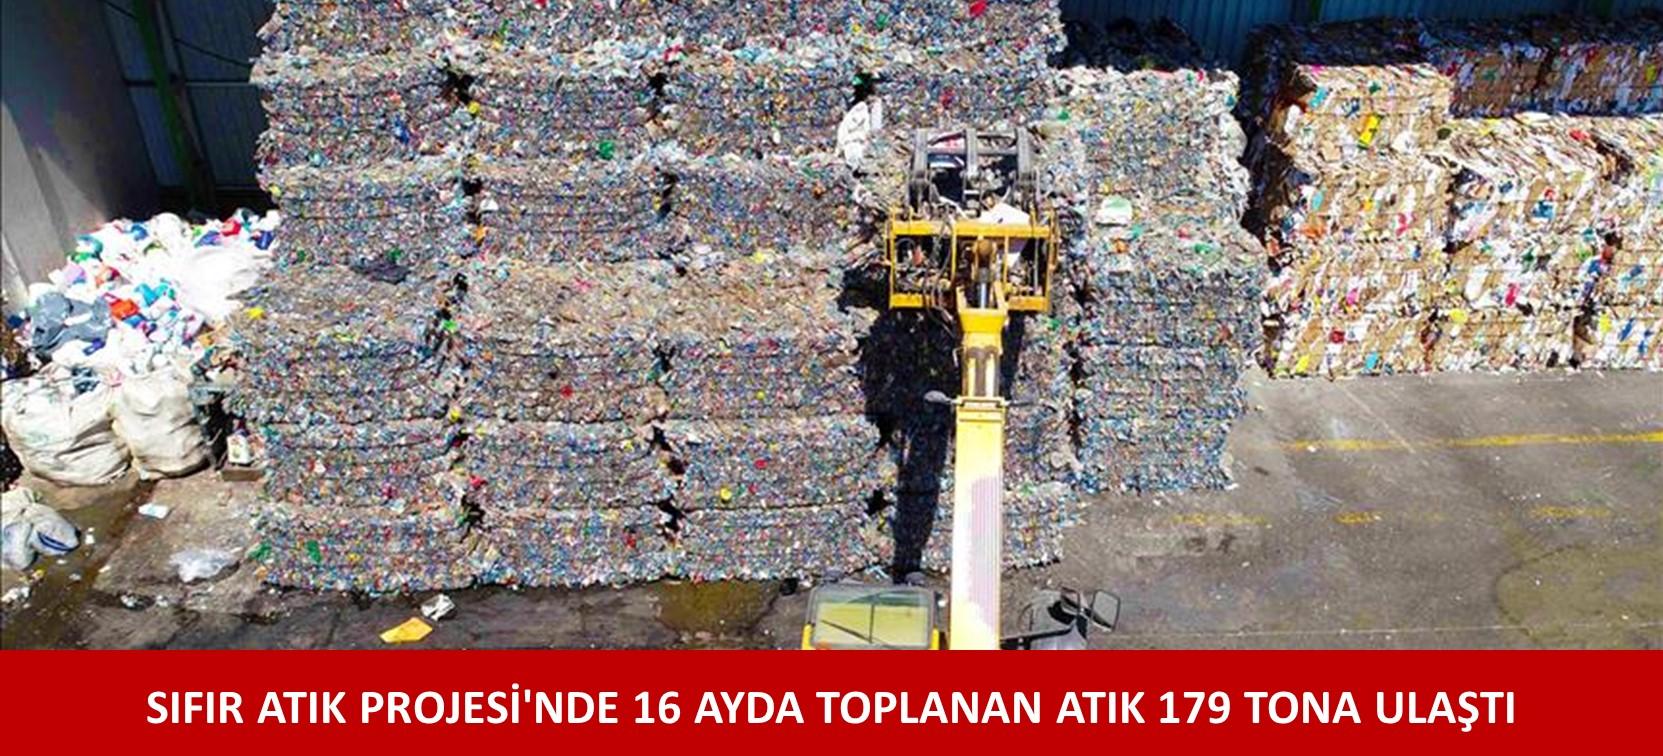 SIFIR ATIK PROJESİ'NDE 16 AYDA TOPLANAN ATIK 179 TONA ULAŞTI